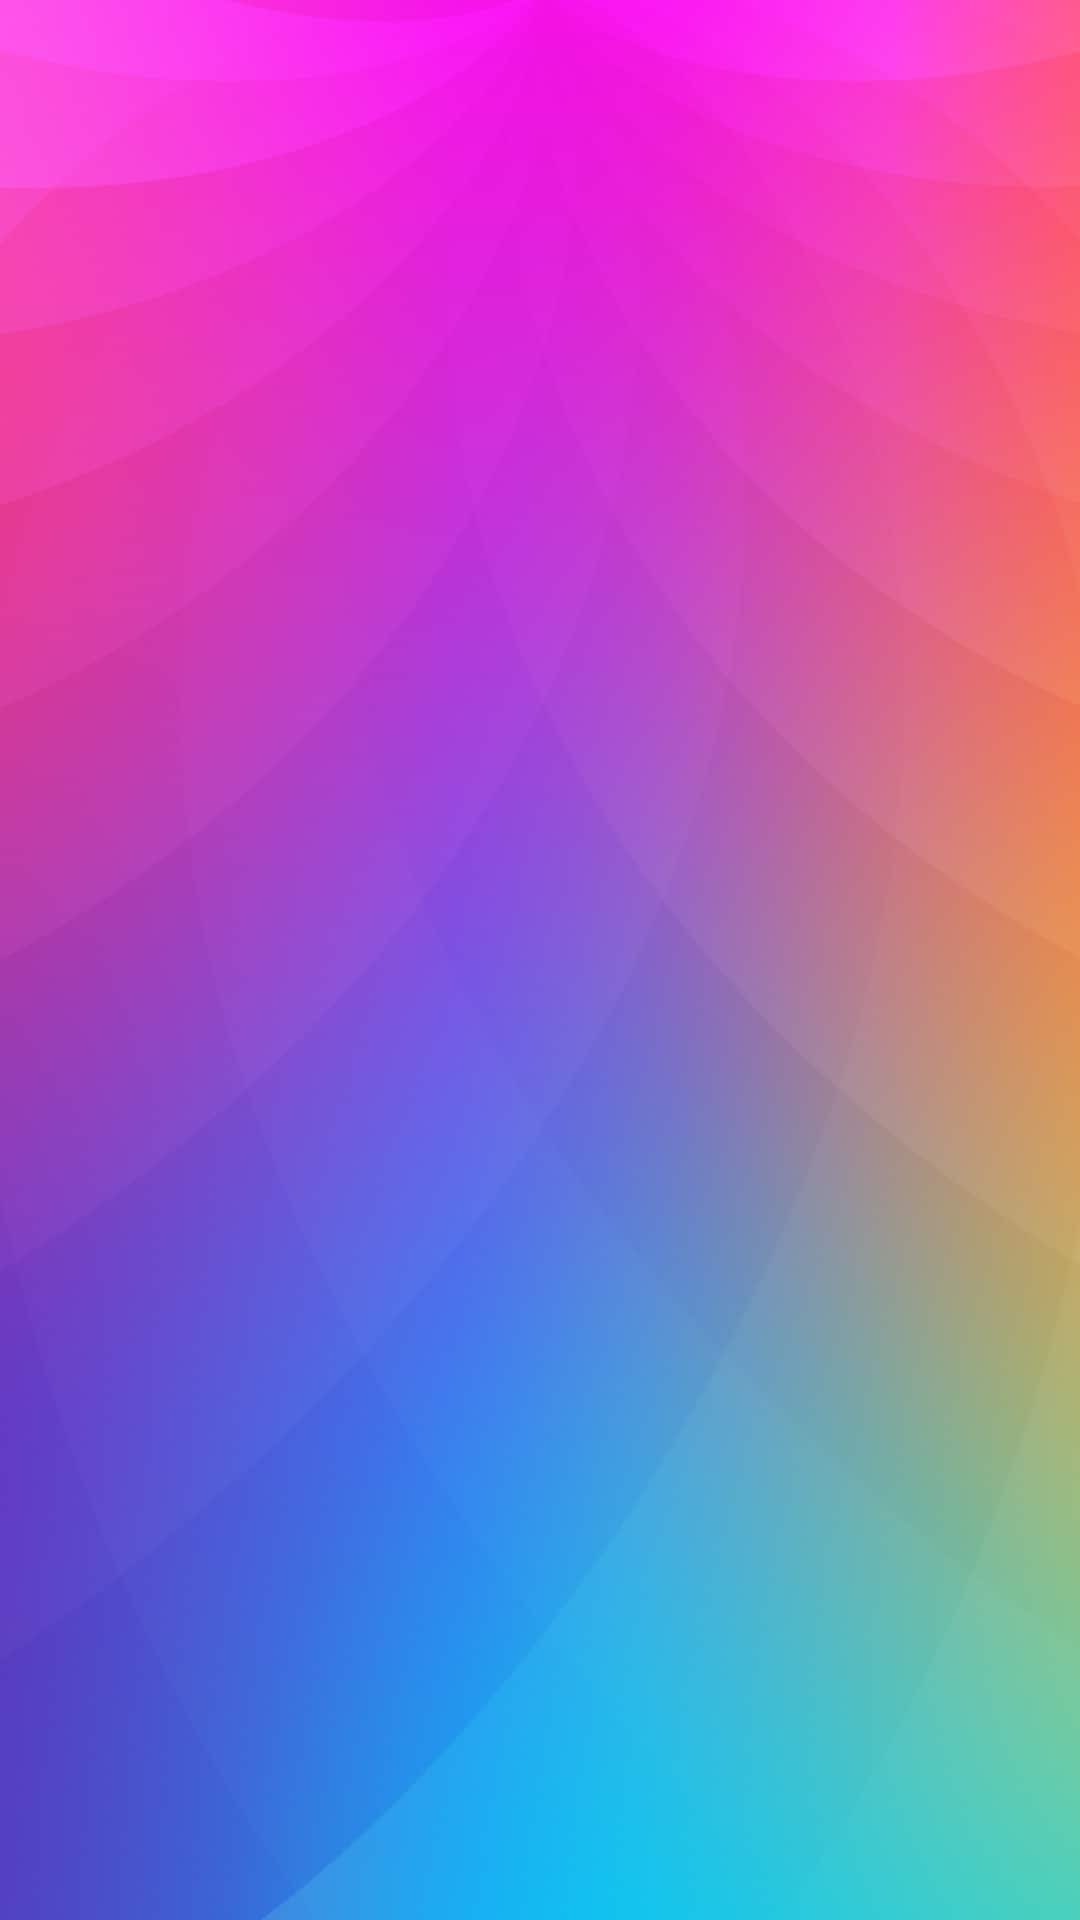 Meizu MX5 wallpaper 9